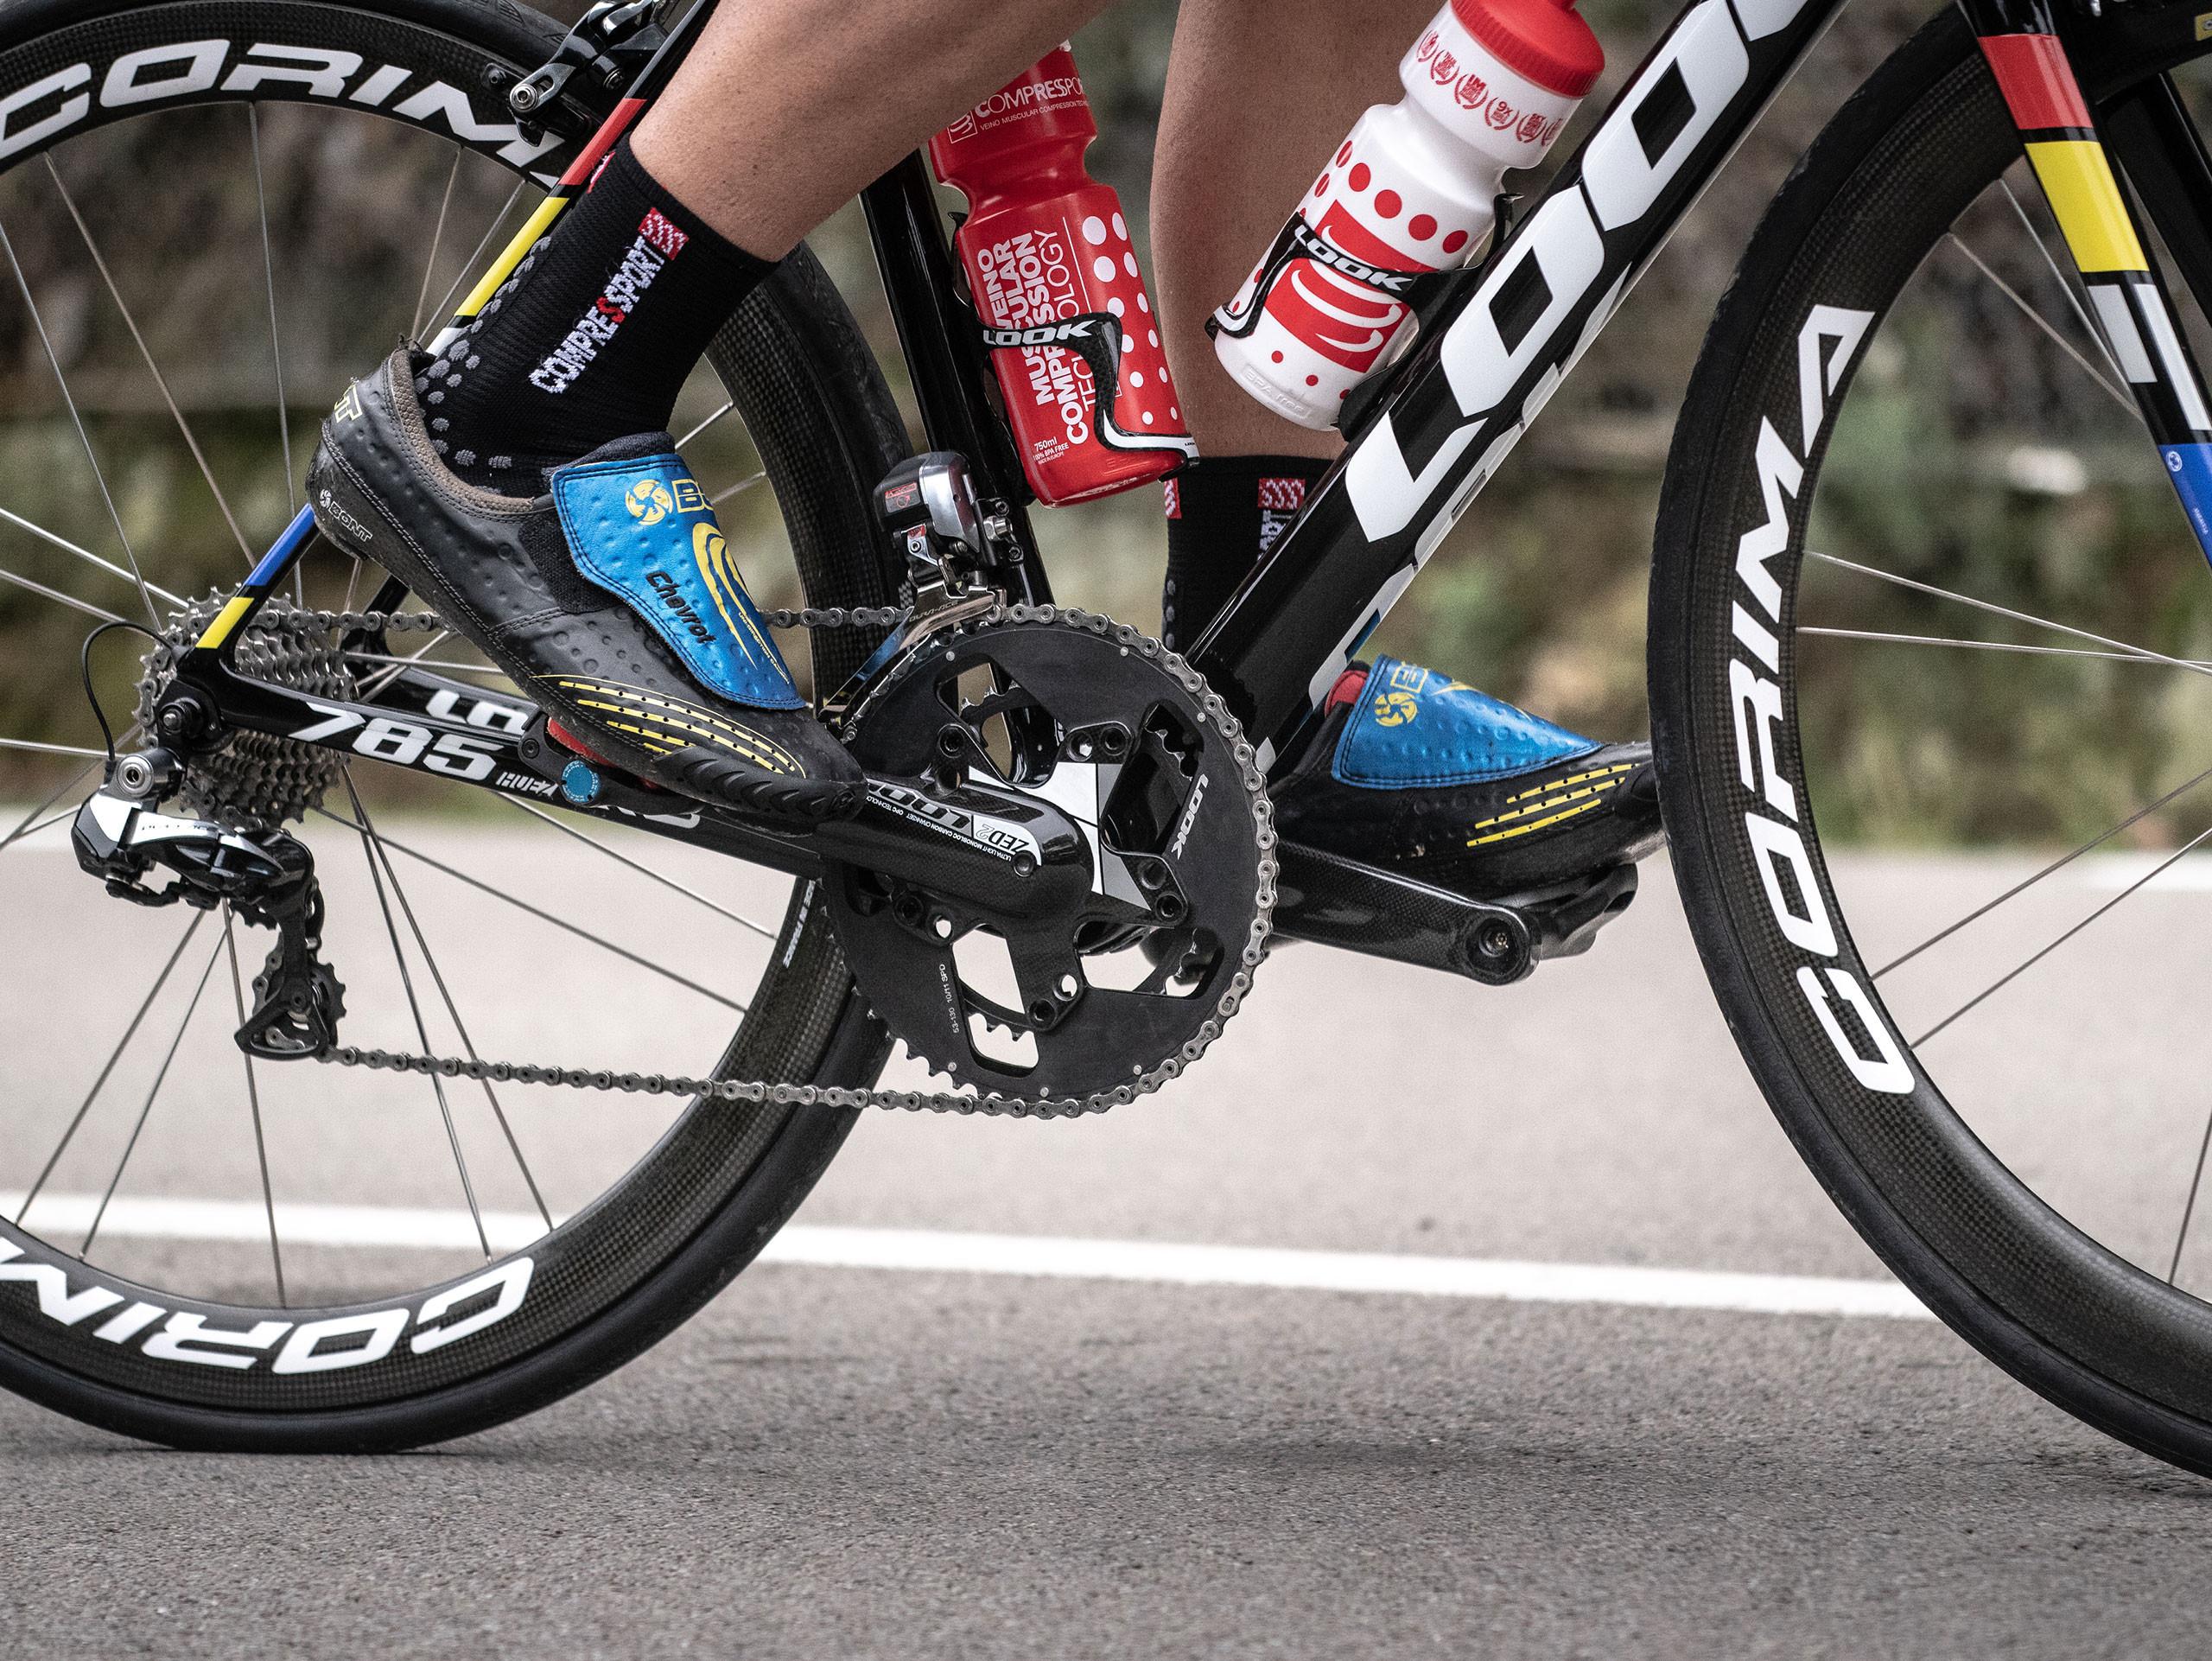 Calcetines deportivos pro v3.0 Bike negros